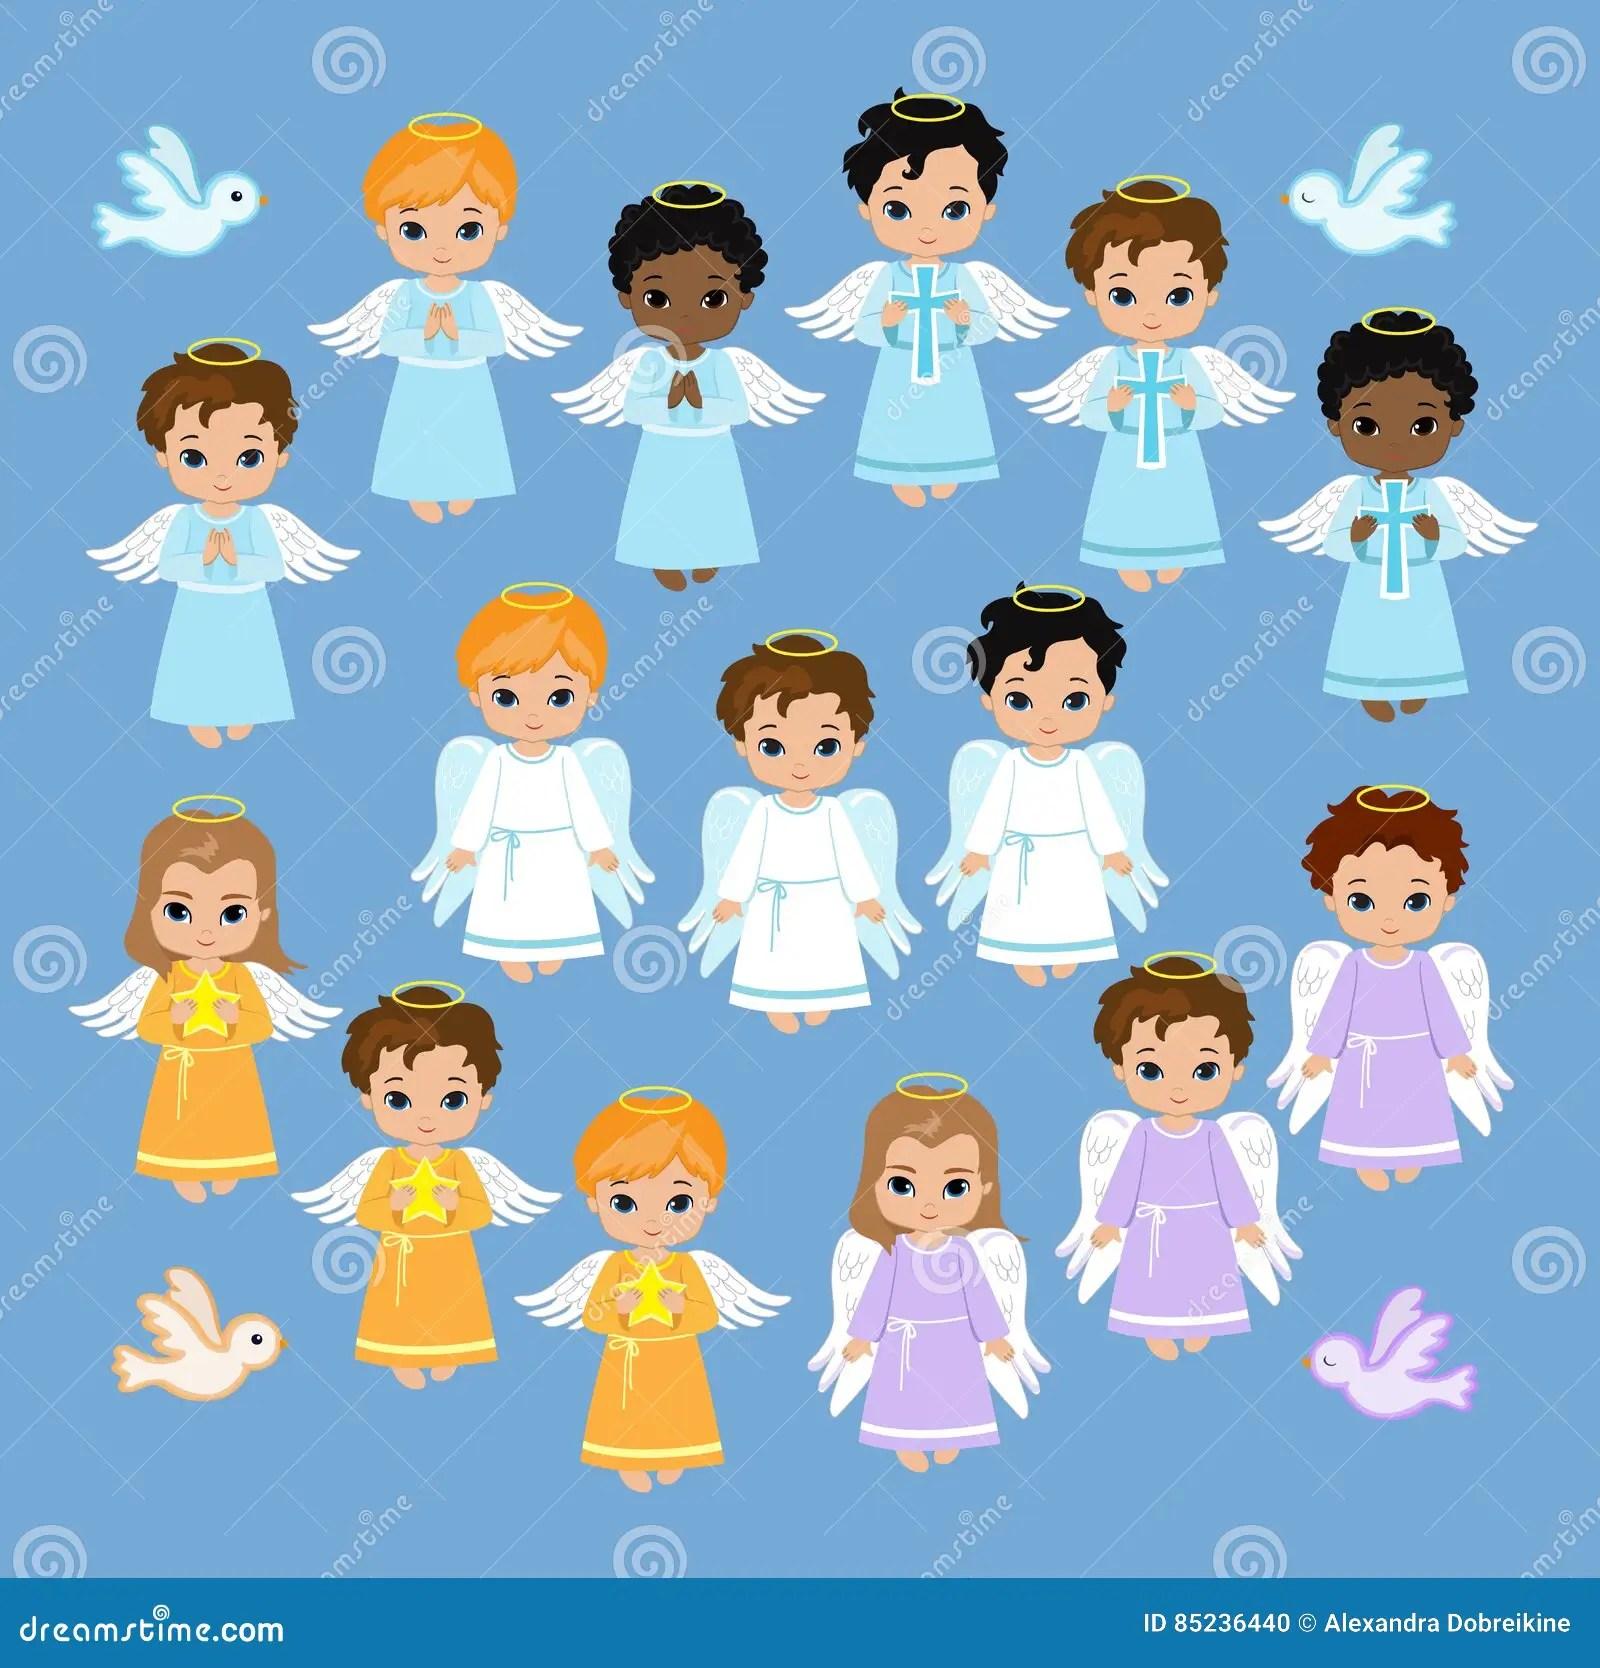 hight resolution of angel digital clipart set angel boys on the sky baptism